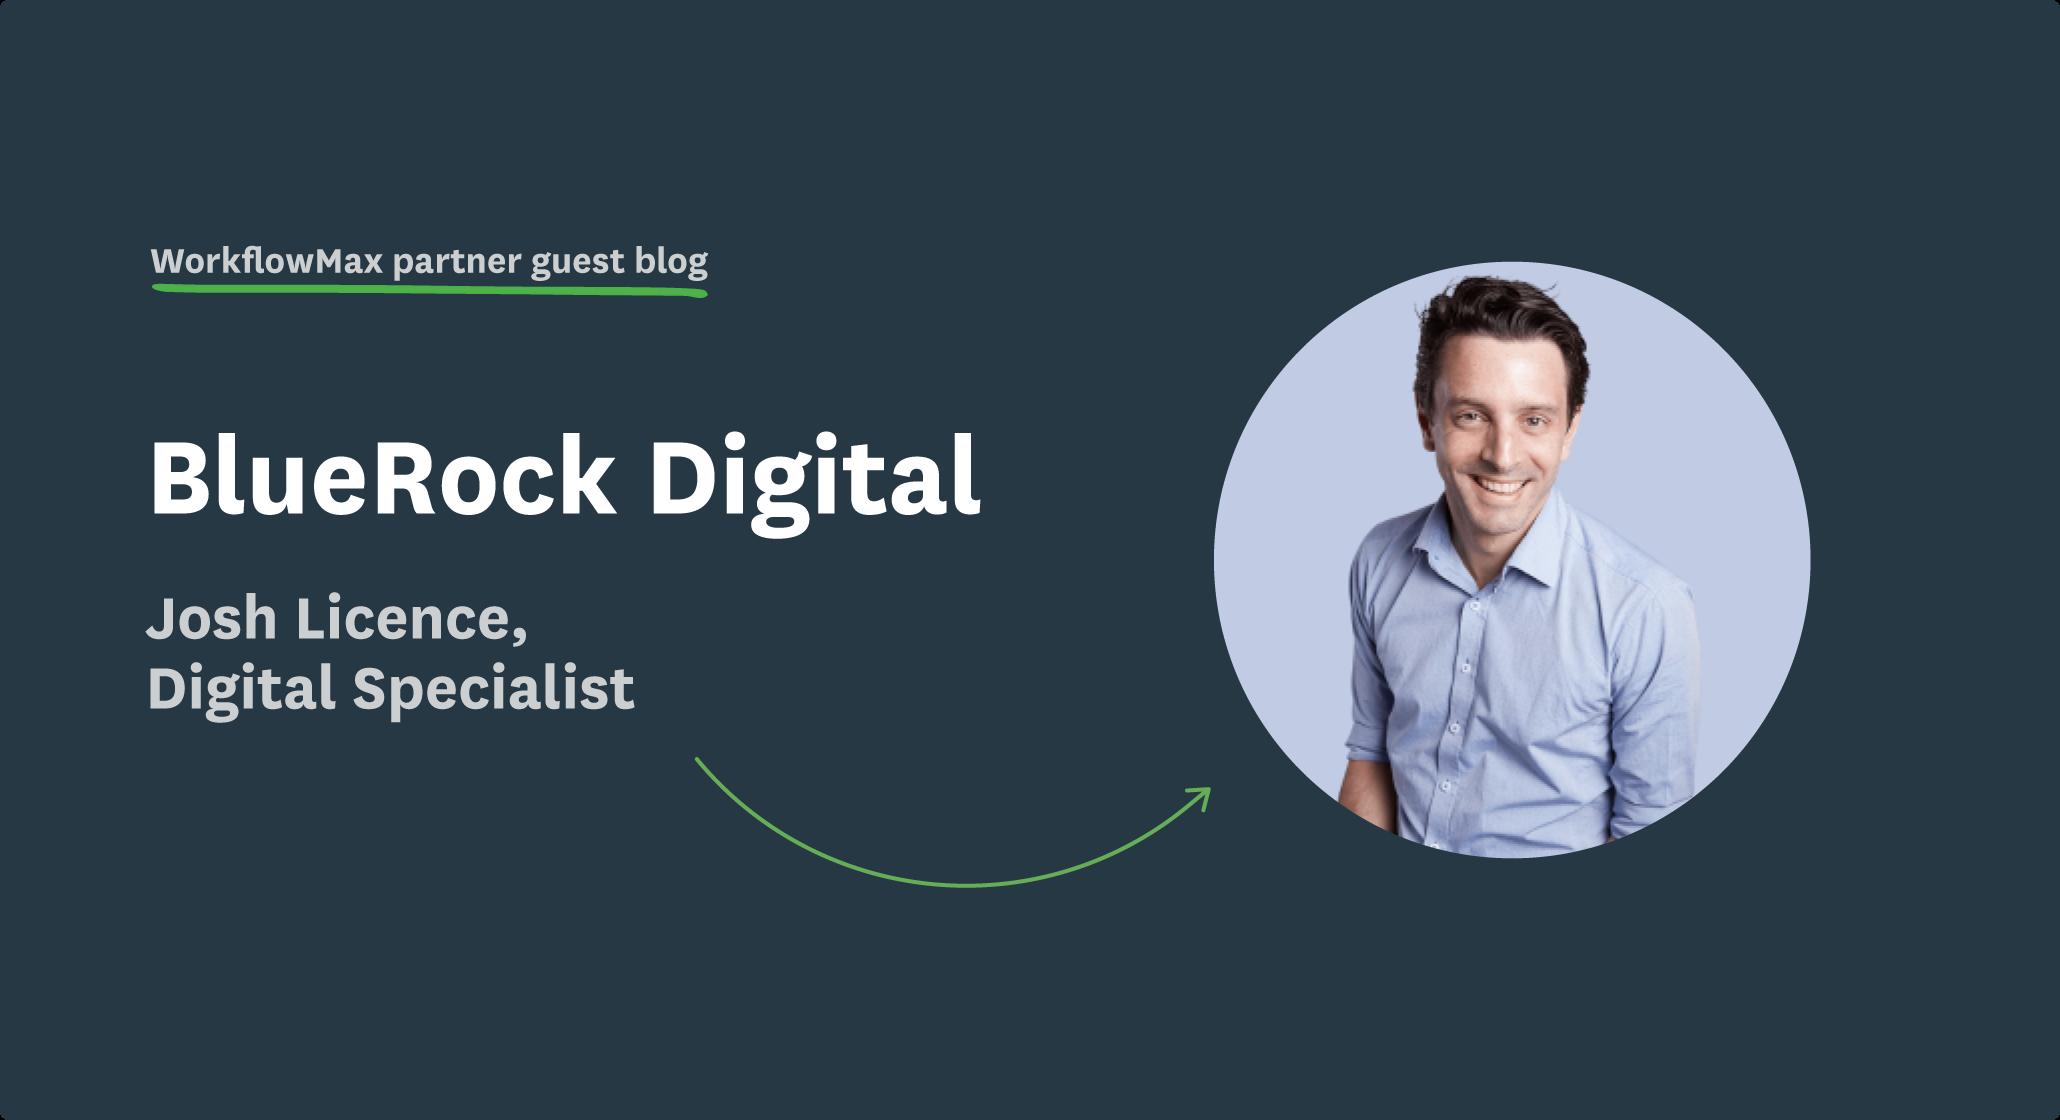 Josh License, Digital Specialist from BlueRock Digital